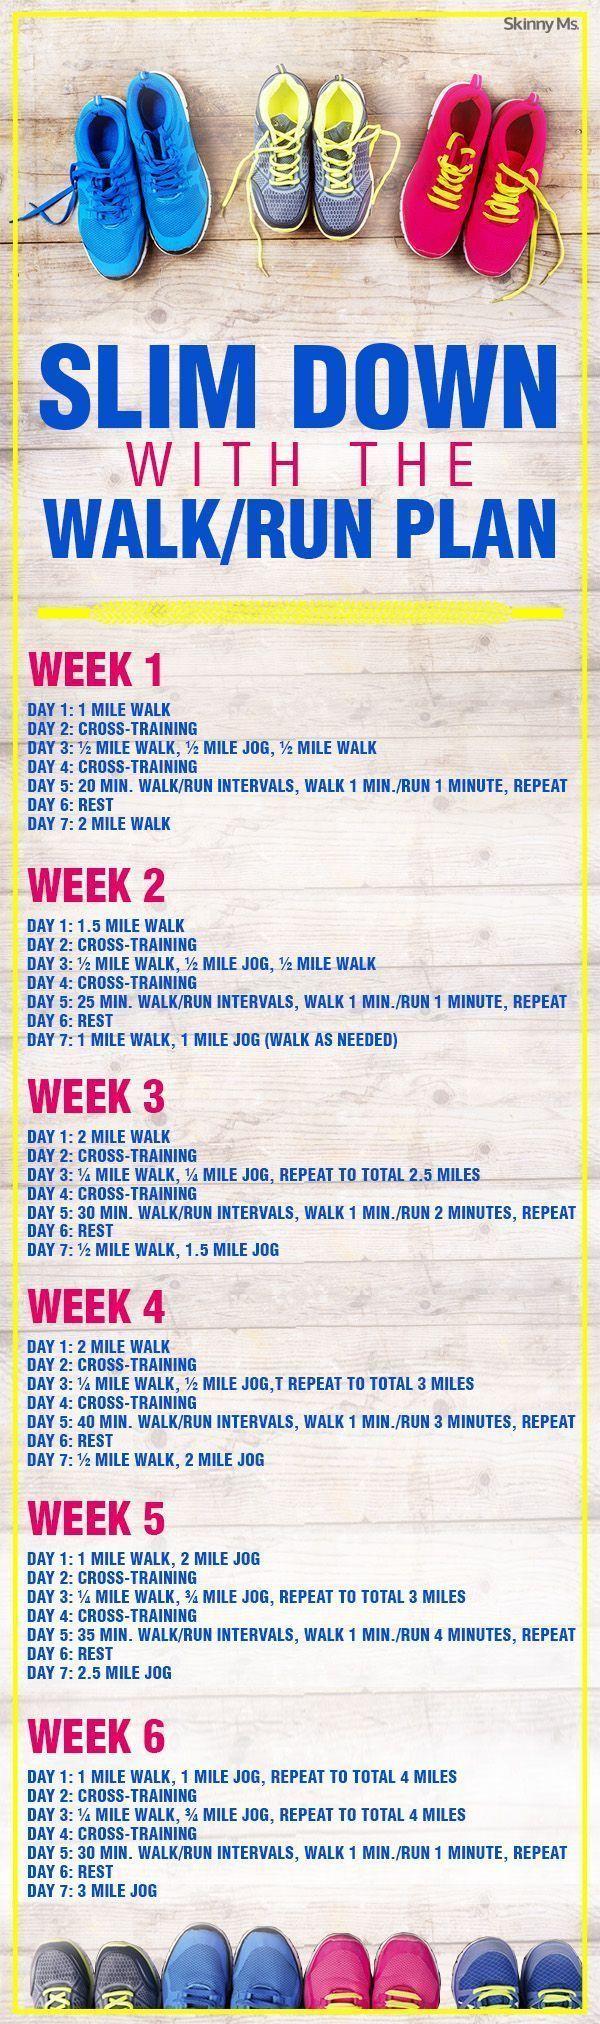 Slim Down with the Walk/Run Plan! #walkrunplan #running #beginnerworkouts